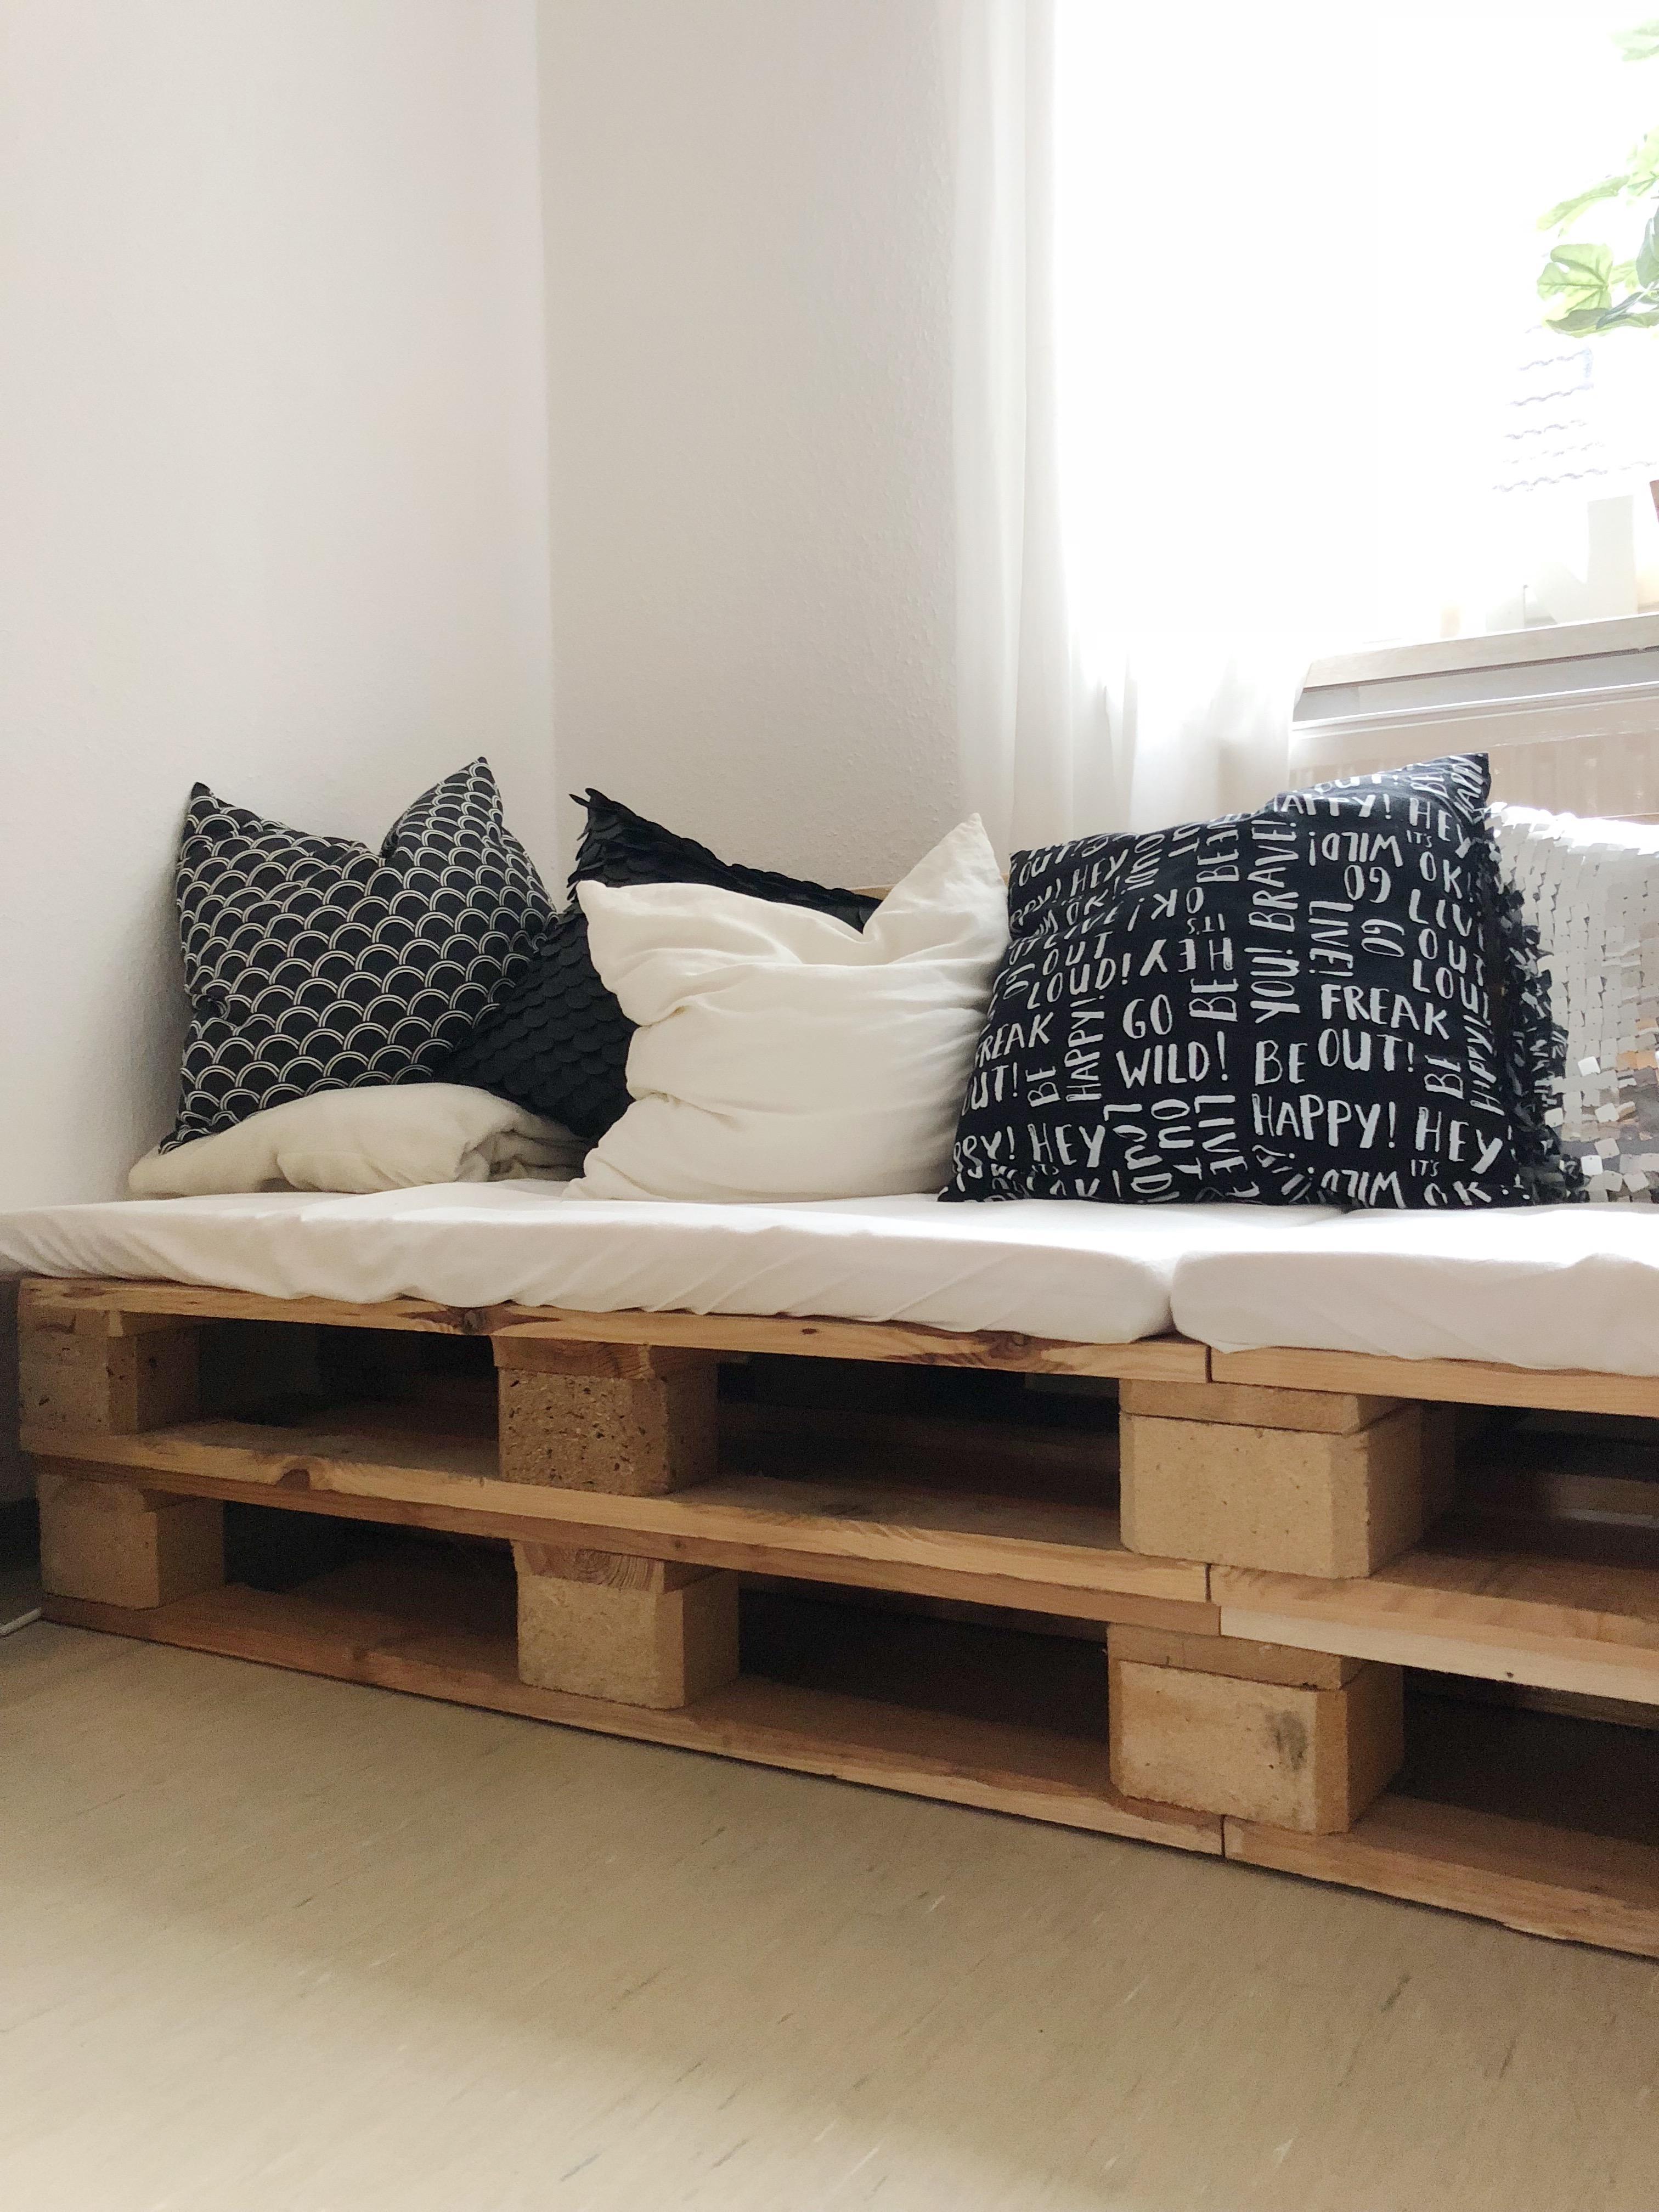 Palettensofaliebe Livingabc Palettenmoebel Diy Couchmagazine Couchstyle  5c168195 591d 464e 9a80 7ad9933c275f